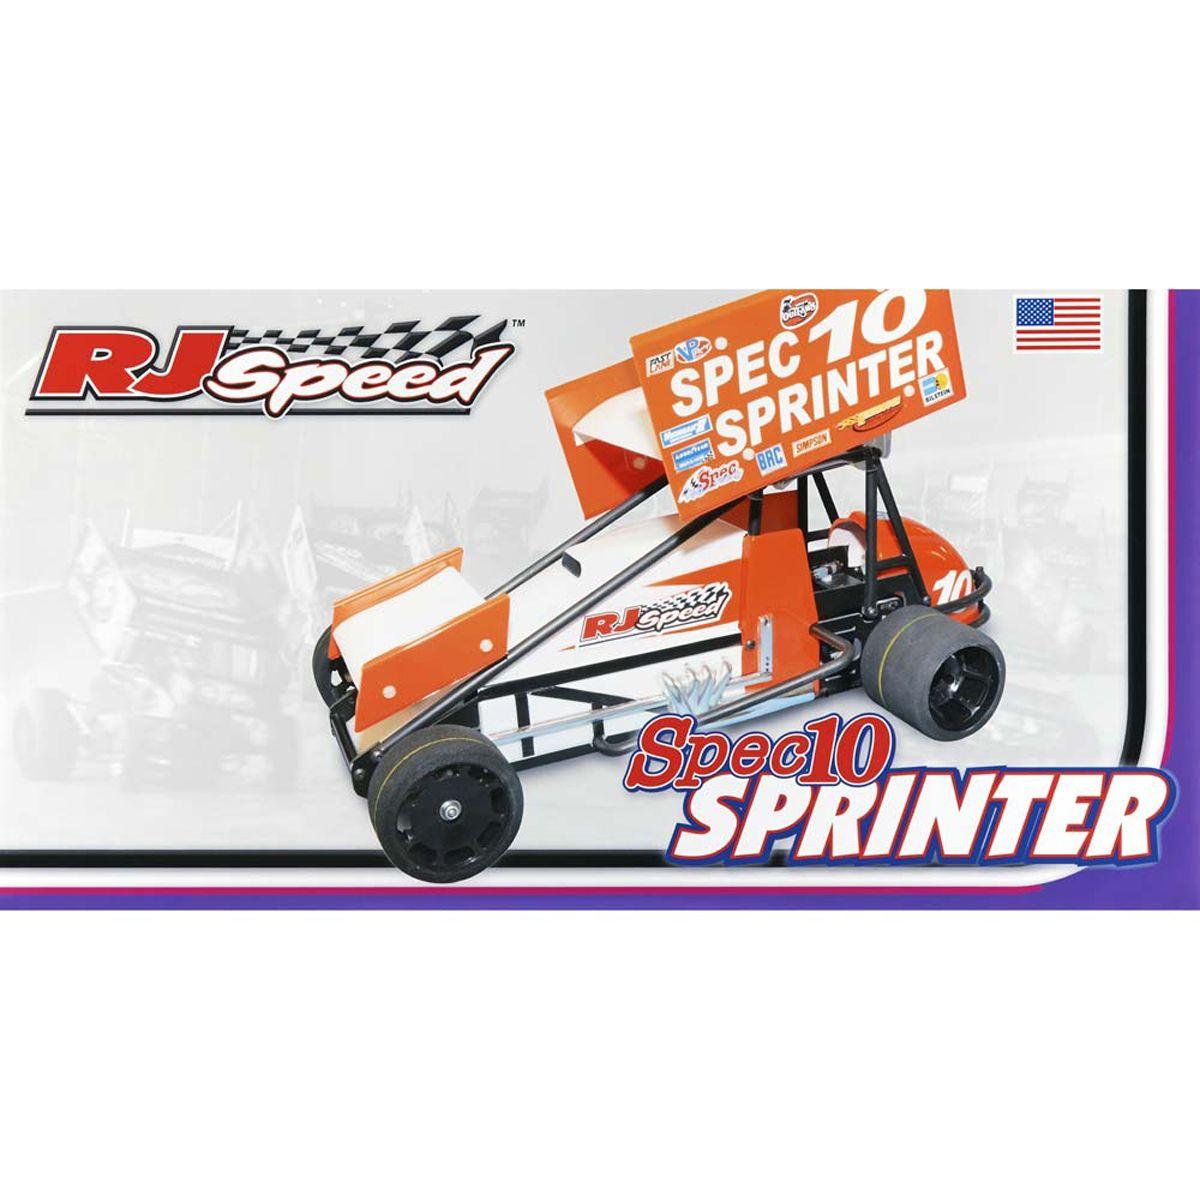 Details About Rj Sd 1 10 Electric Spec10 Sprinter Sprint Car Kit